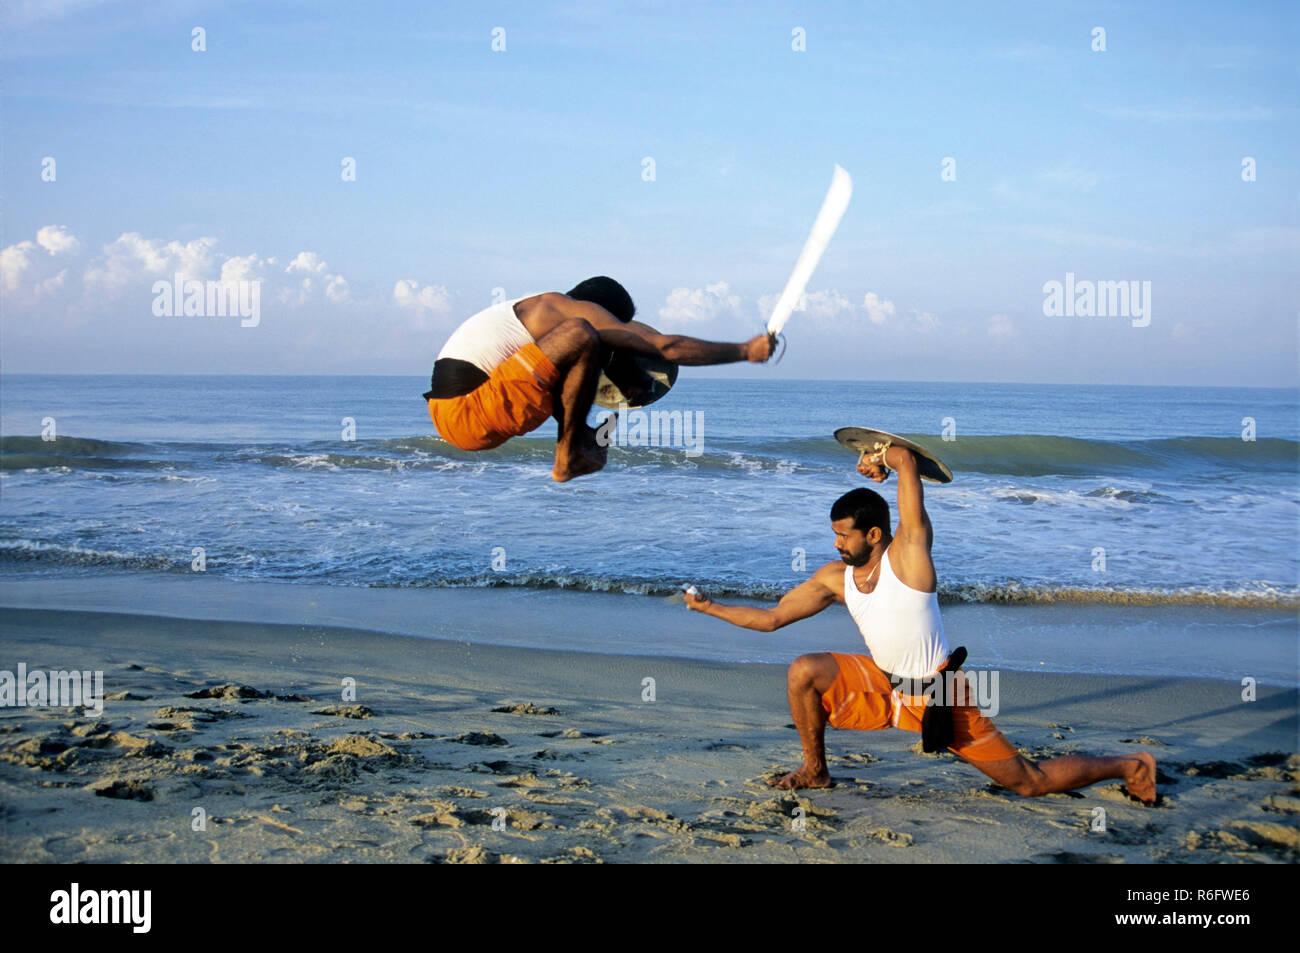 Kalarippayattu, Swords and shields fighting, Ancient Martial Art of Kerala, India MR#299 - Stock Image